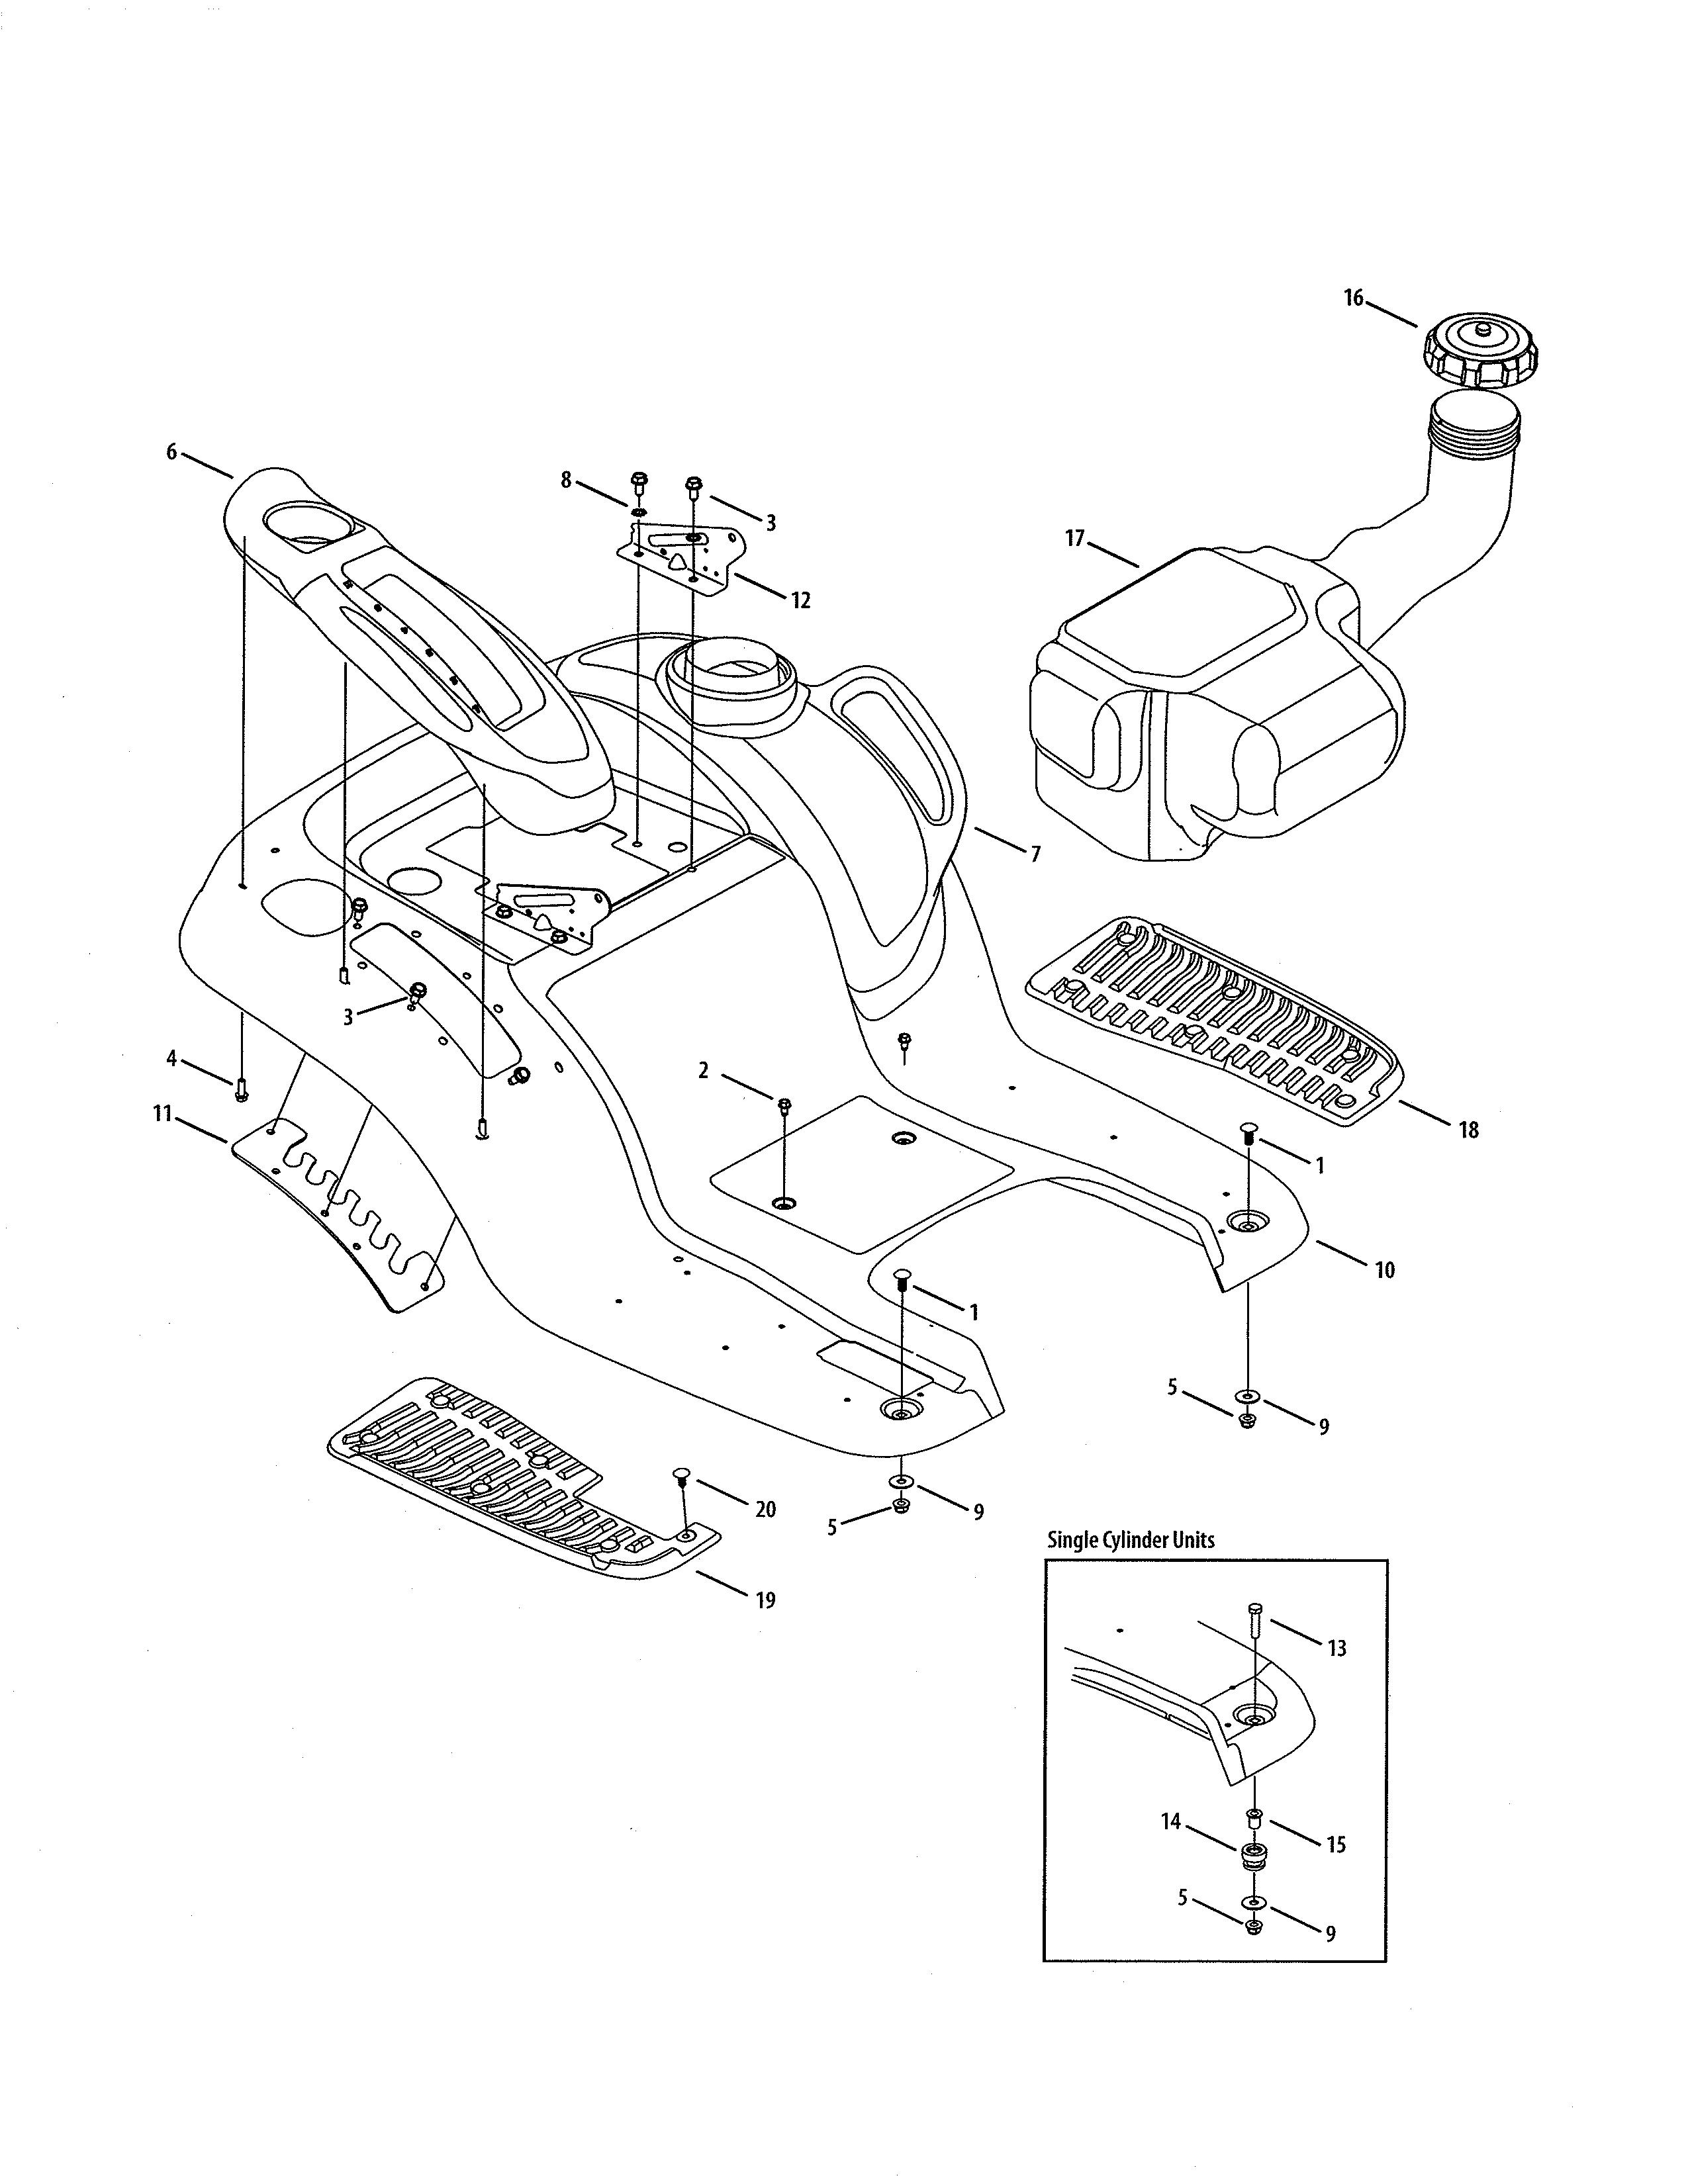 Wiring Diagram For A Cub Cadet Model 19016